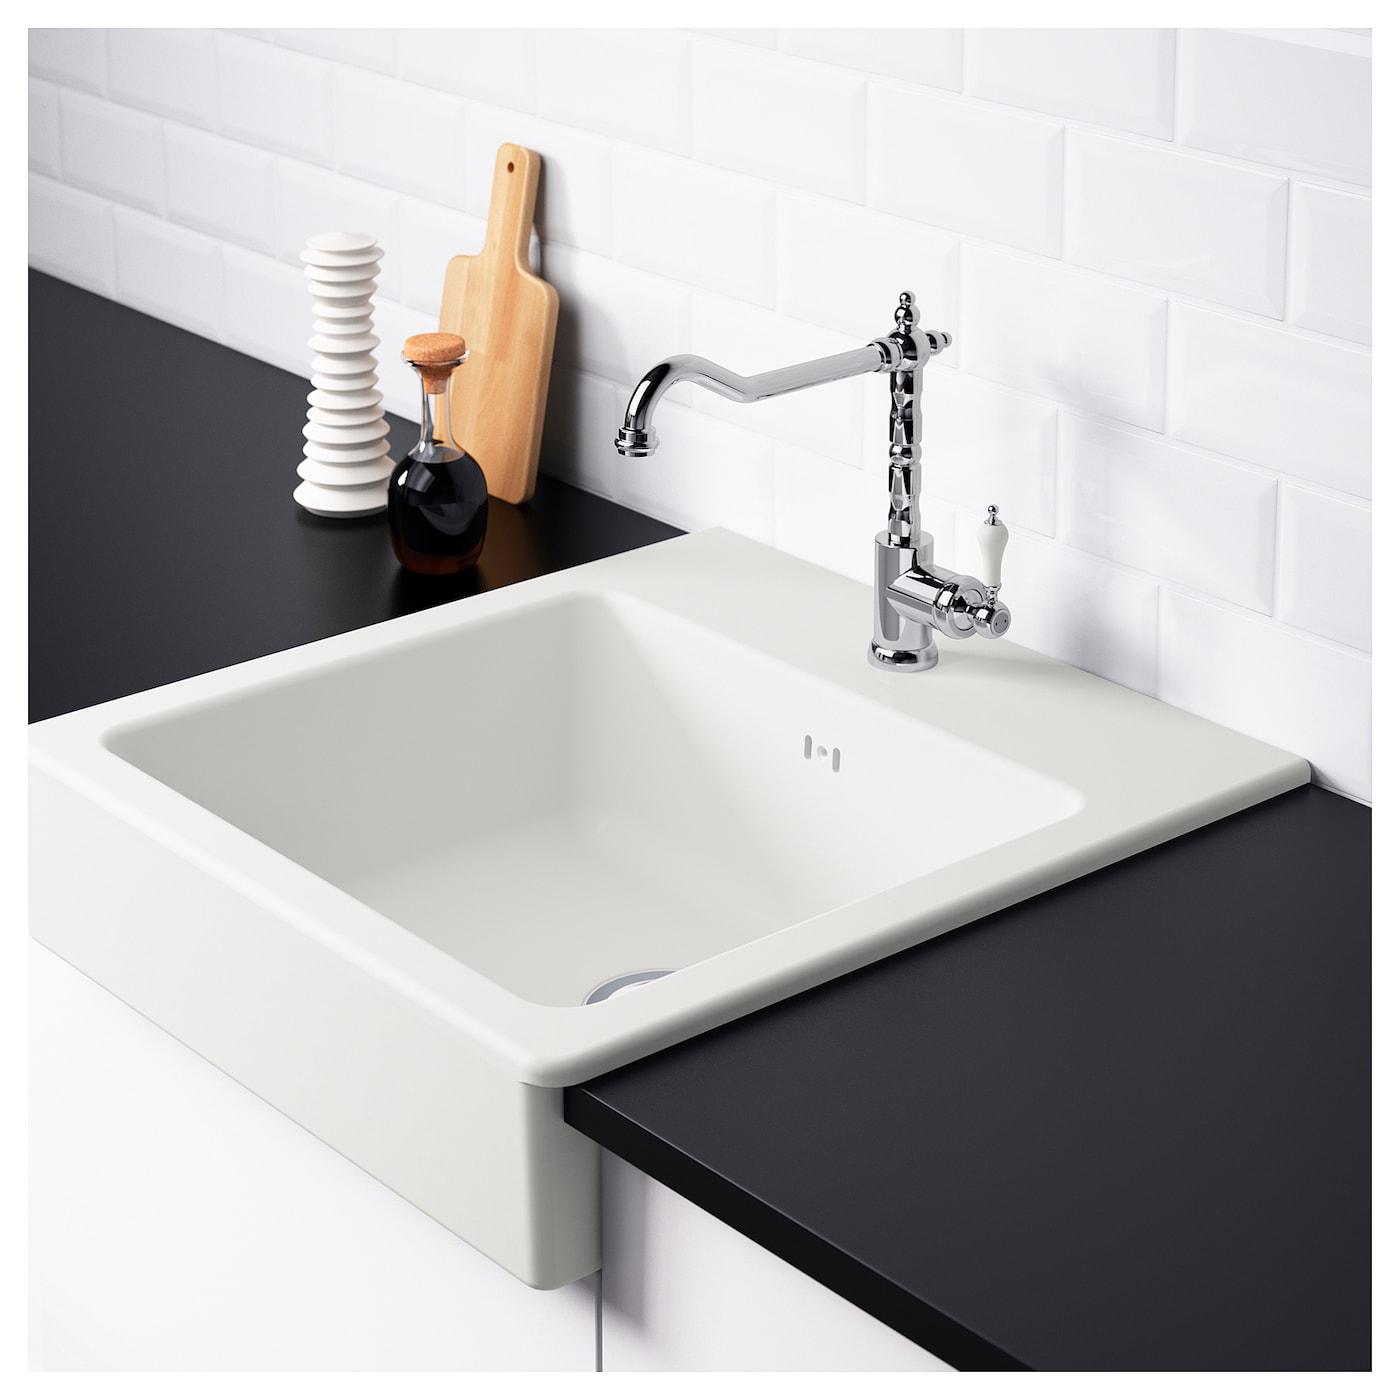 DOMSJÖ Onset Sink, 1 Bowl White 62x66 Cm